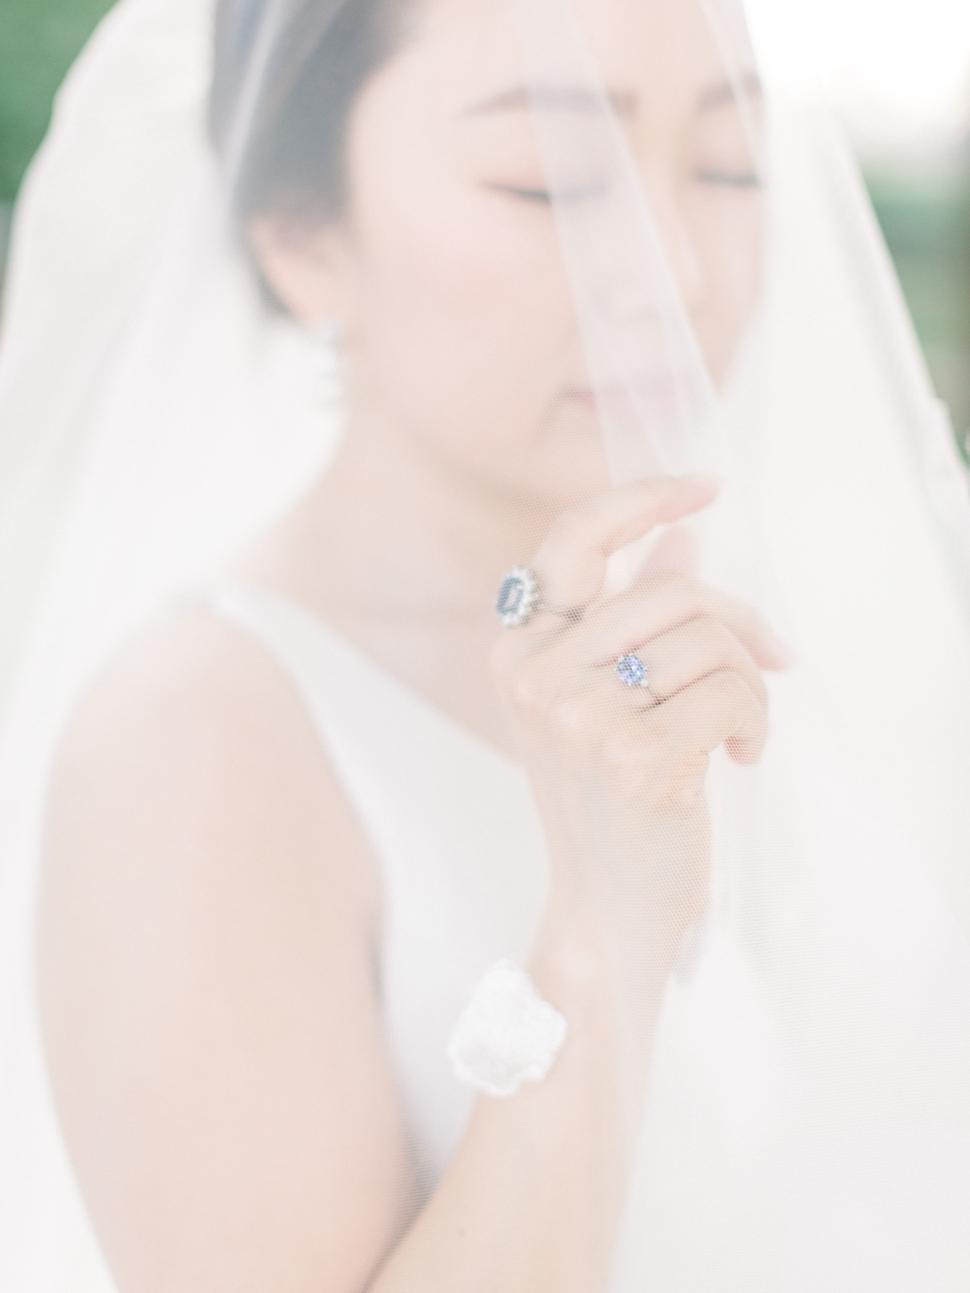 Bourne-Mansion-Wedding-Photos-Cassi-Claire-Long-Island-Wedding-Photographer_37.jpg